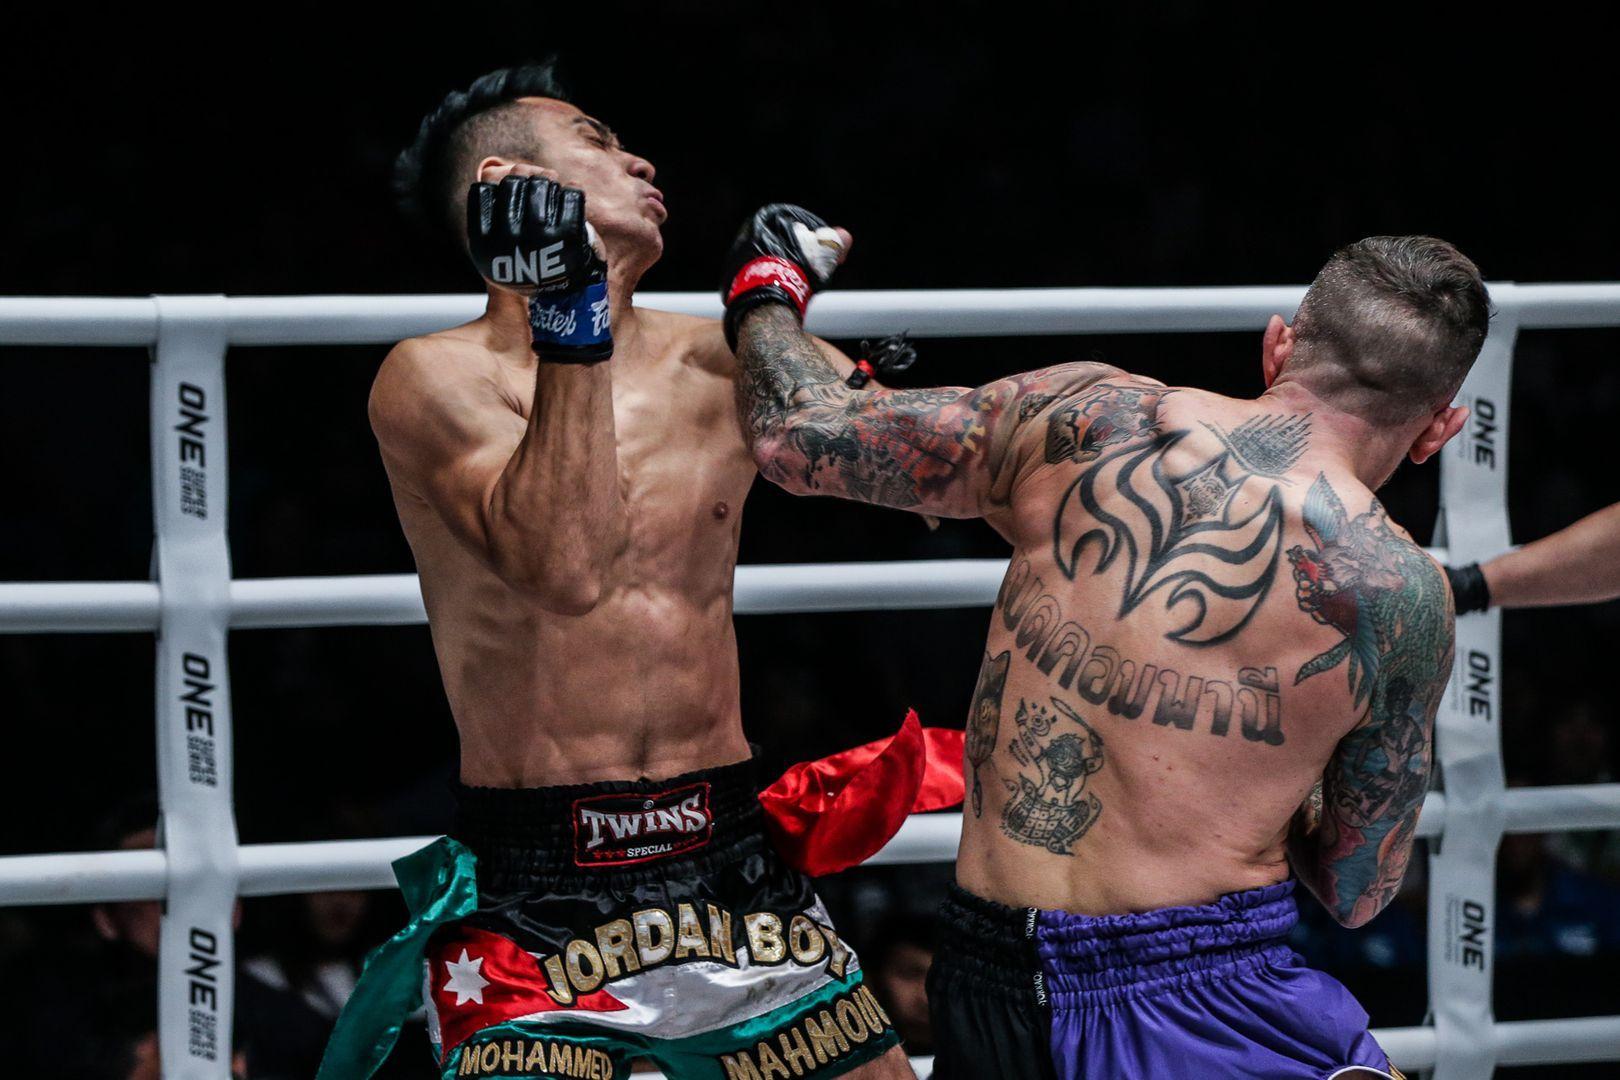 Liam Harrison defeats Mohammed Bin Mahmoud at ONE A NEW TOMORROW in Bangkok